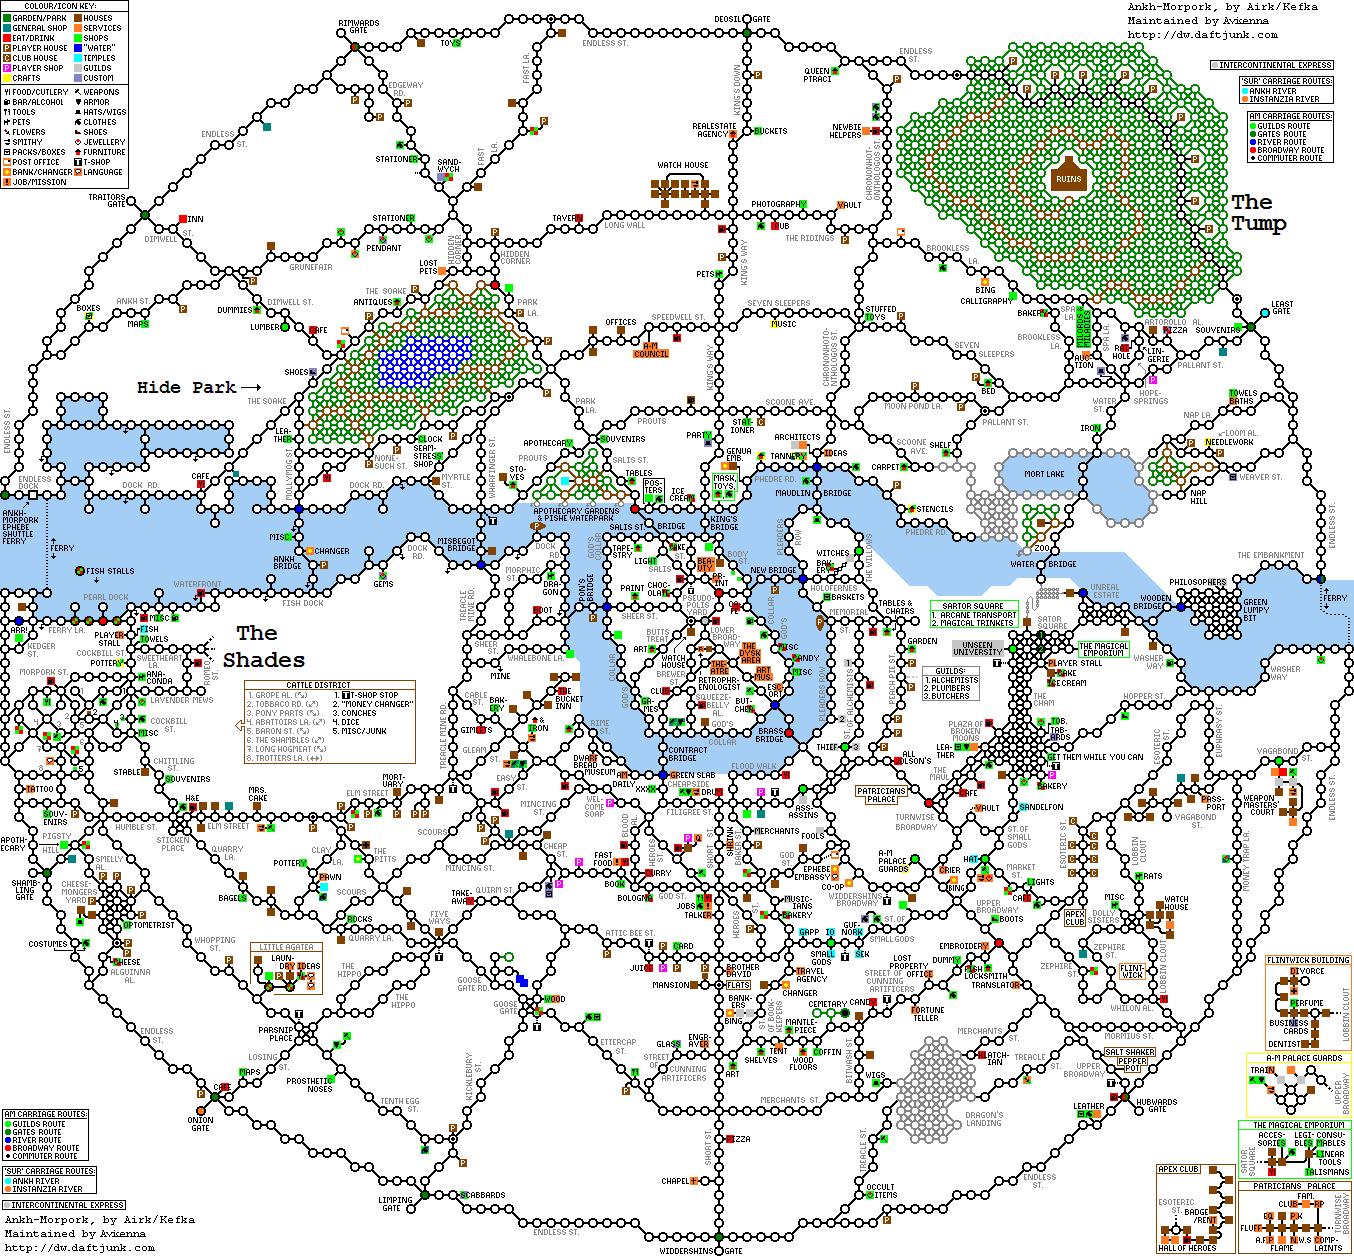 Ankh Morpork Map Kefka's Discworld MUD Maps